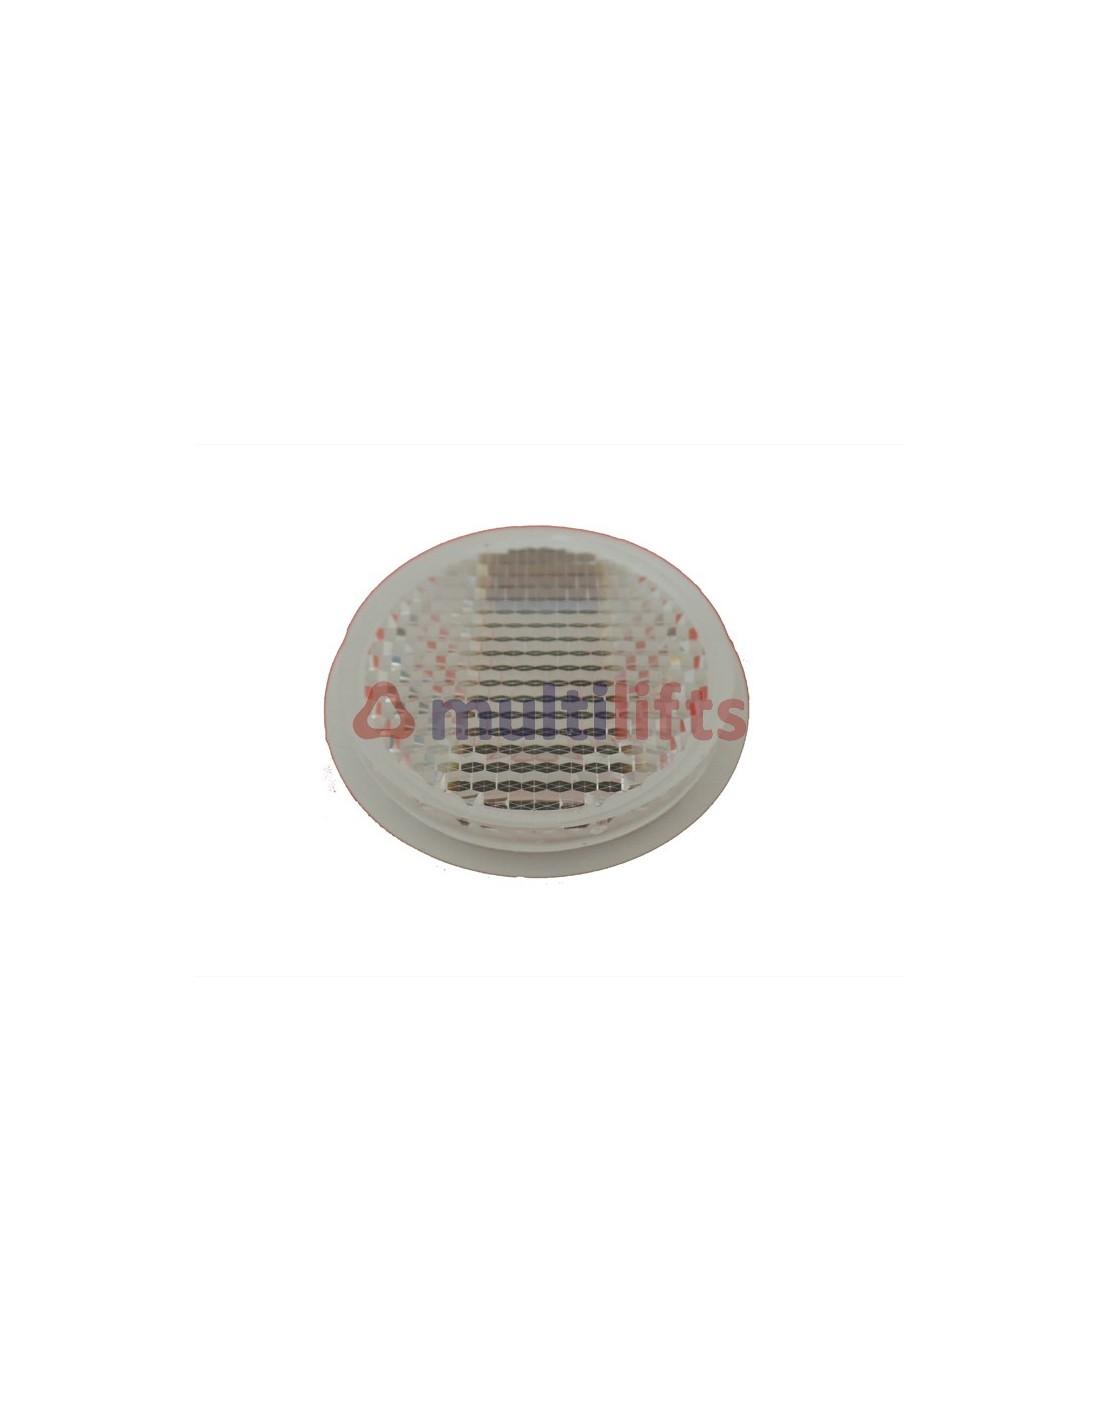 Espejo adhesivo diametro 46 0x6 5 er460 multilifts - Espejo adhesivo ...